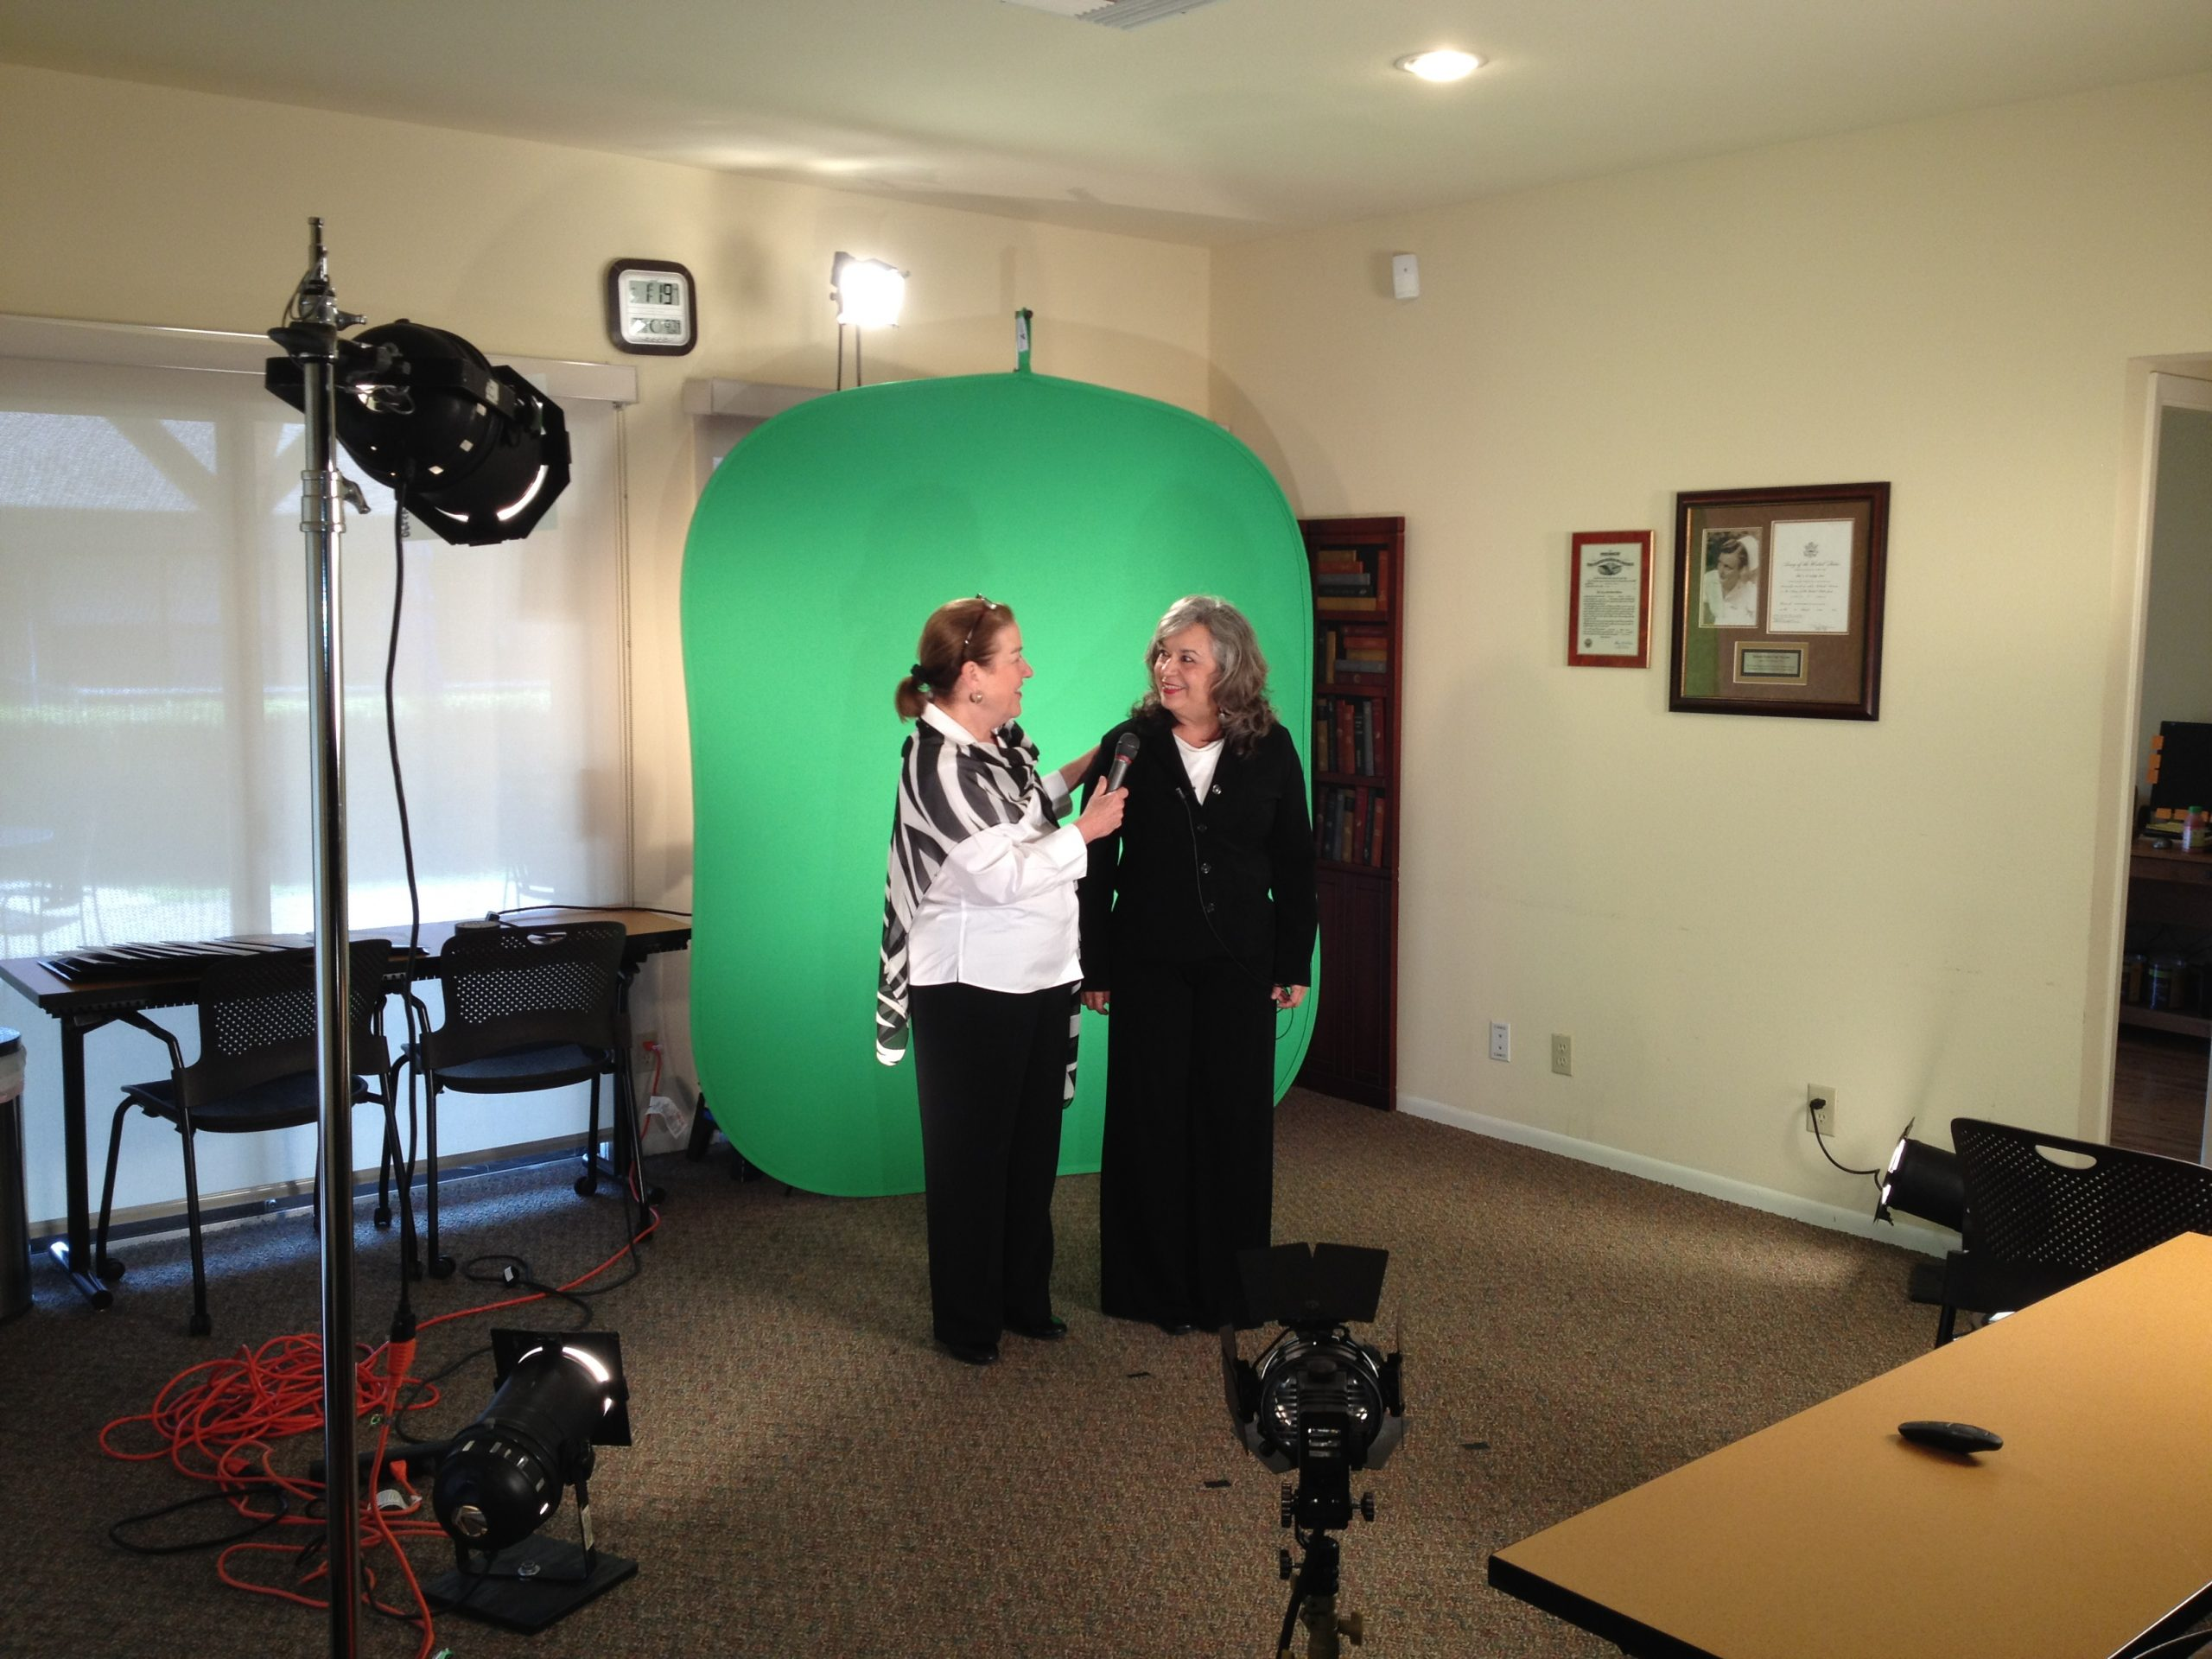 Video recording using green screen technology – Maria Wellisch, VP of Corporate Training at Morningside & Virginia Valenzuela